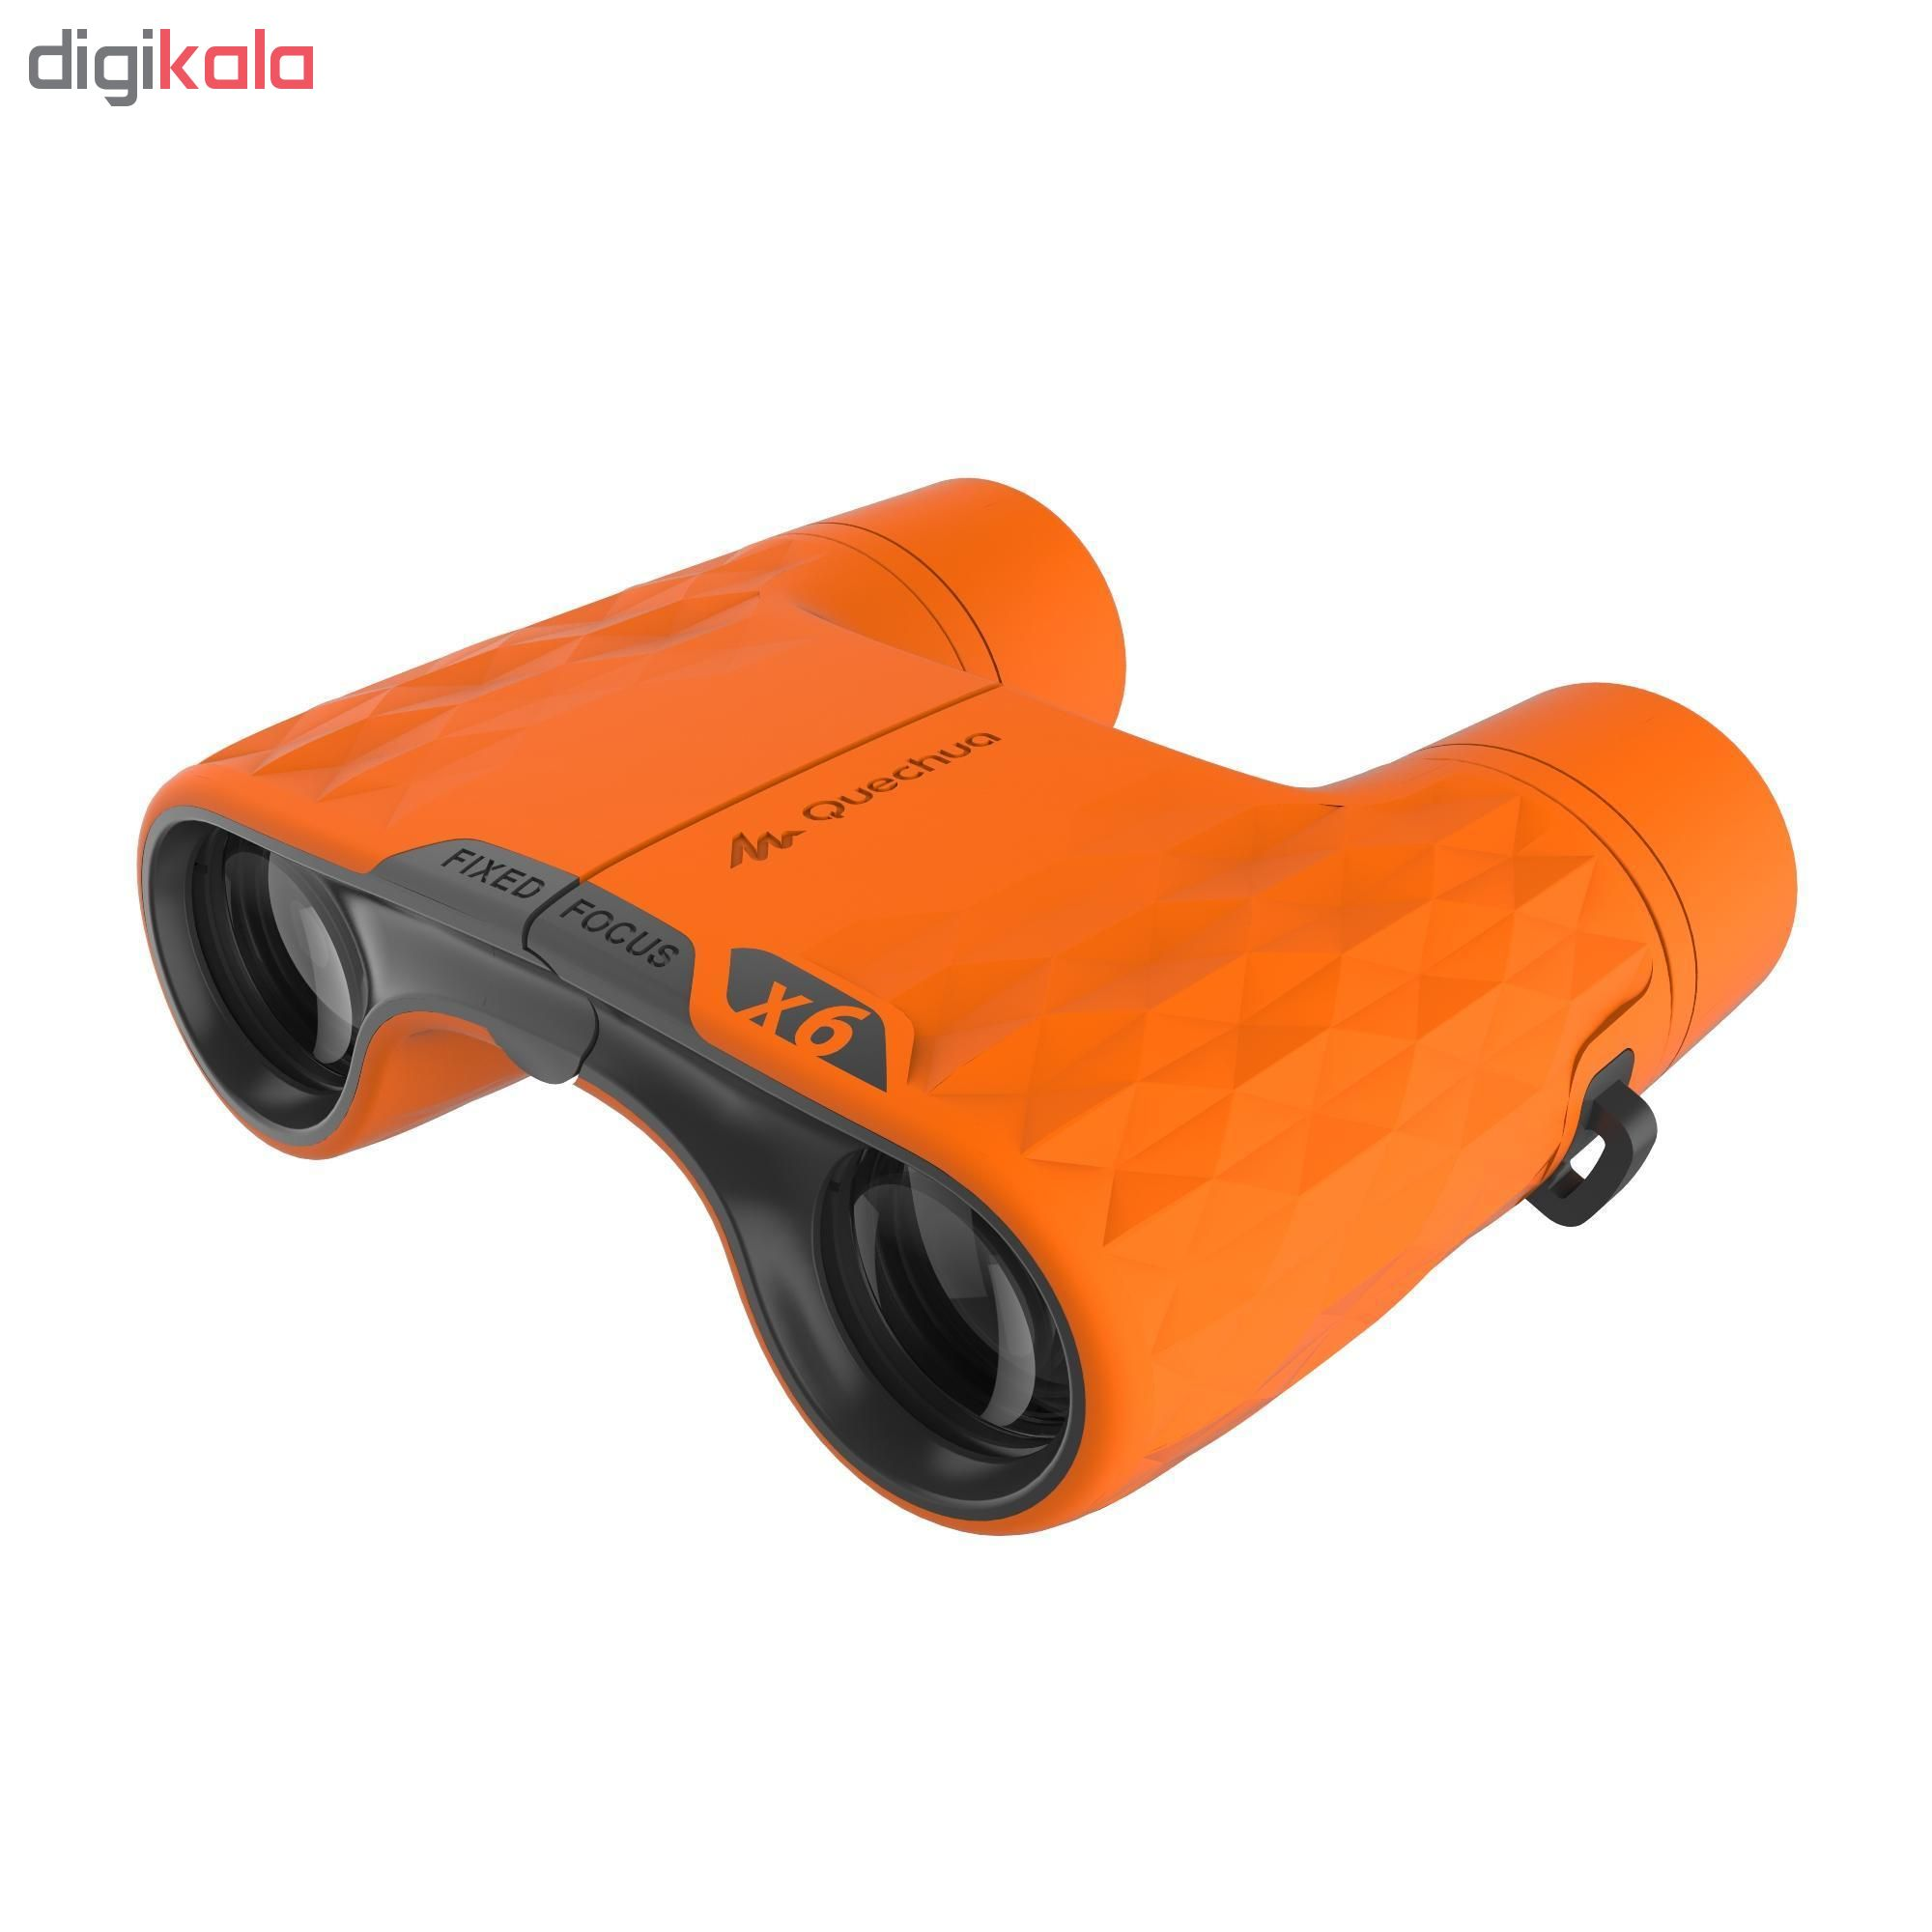 دوربین دو چشمی کچوا مدل mhb100x6o